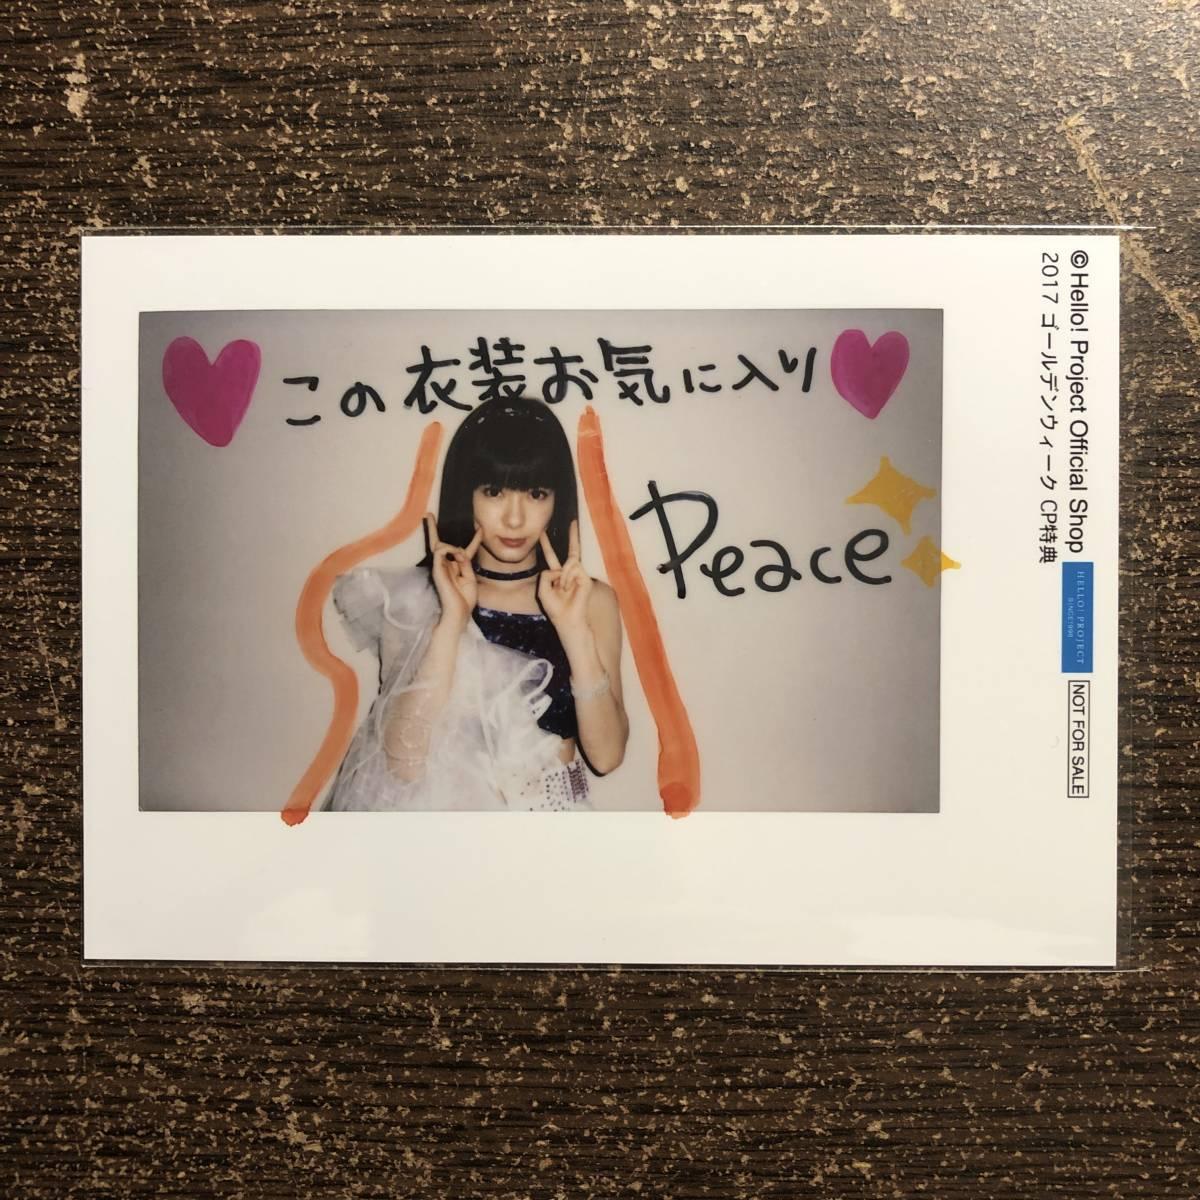 M92-228 モーニング娘。 生田衣梨奈 L版生写真「ゴールデンウィーク キャンペーン特典」_画像1